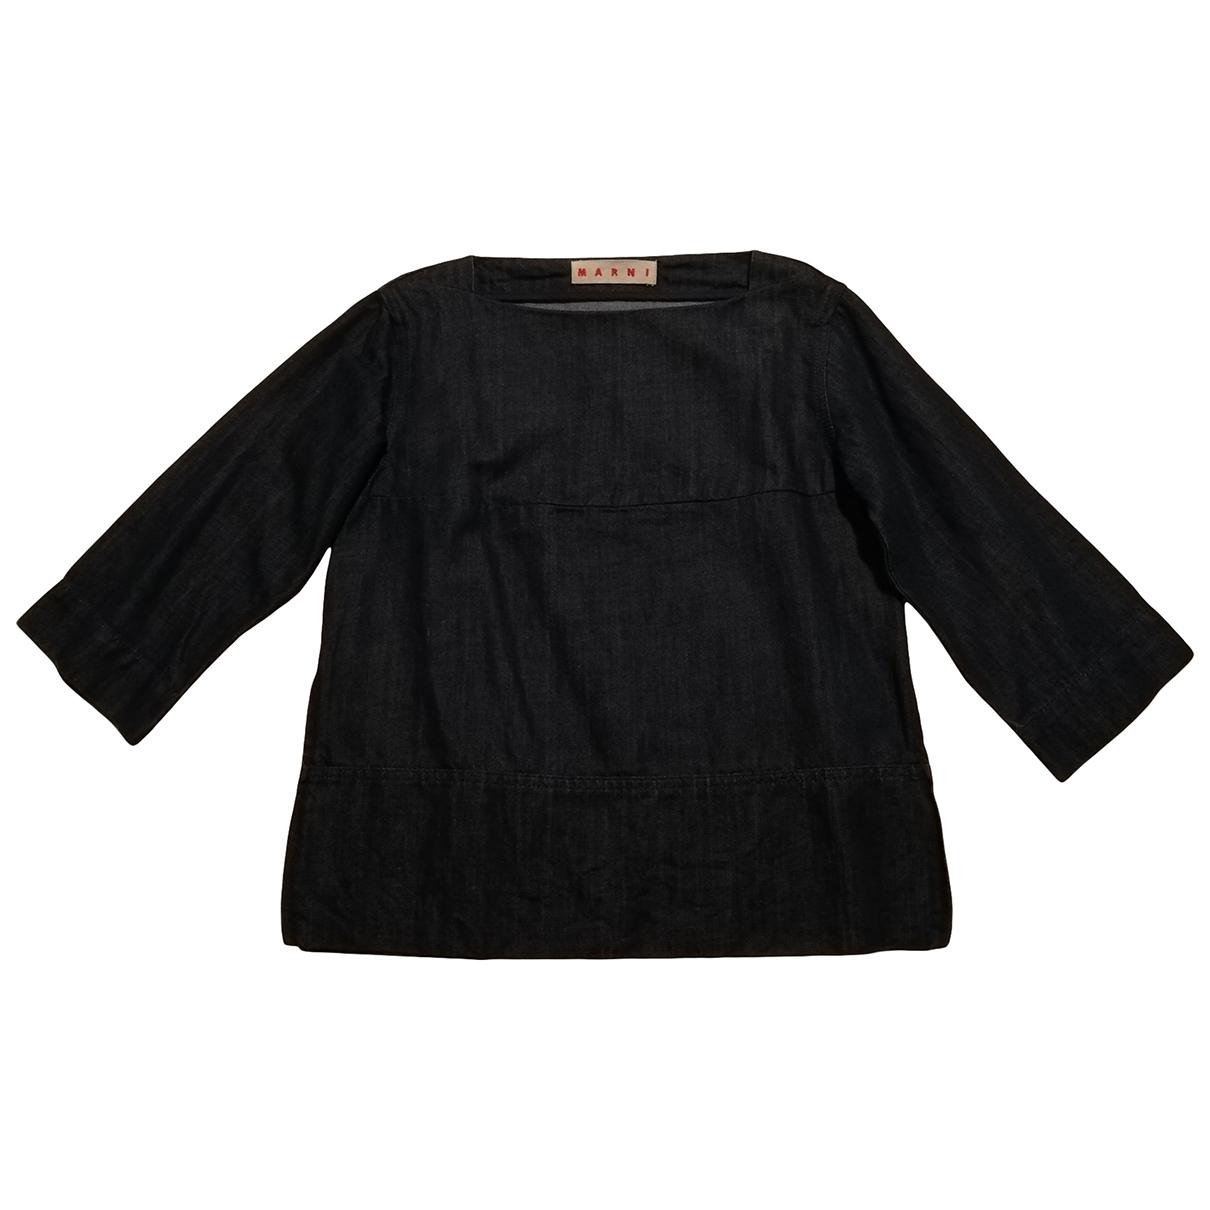 Marni \N Blue Denim - Jeans  top for Women 40 IT